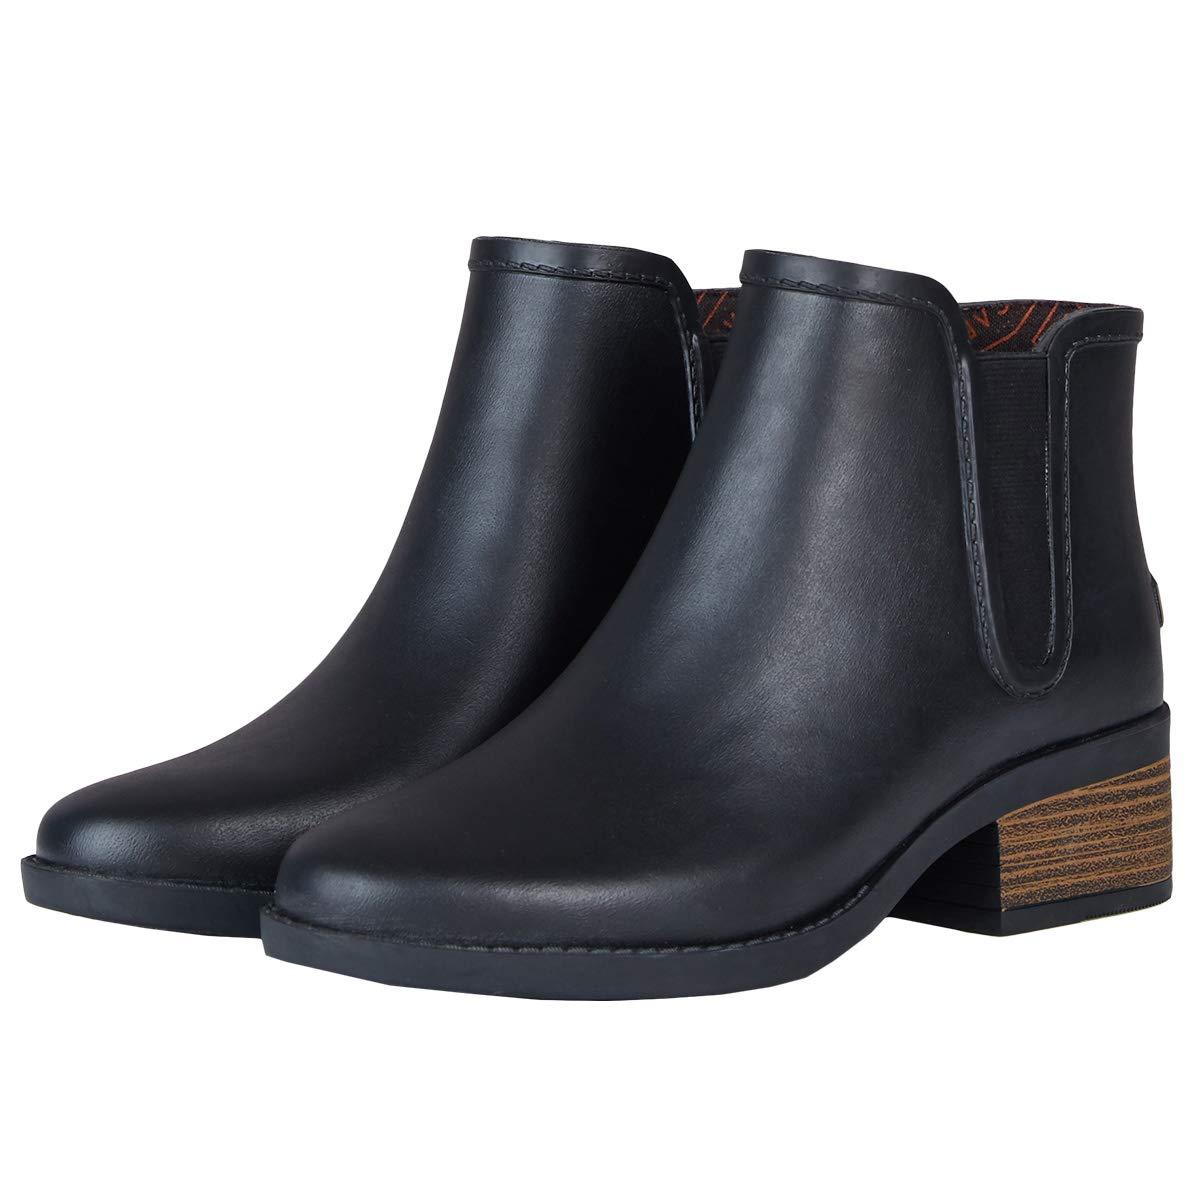 UNICARE Women's Chelsea Rain Boots Waterproof Slip on Shoes Nonslip Short Ankel Boots Rubber Rain Footwear Handmade, Black, US Size 7 by UNICARE